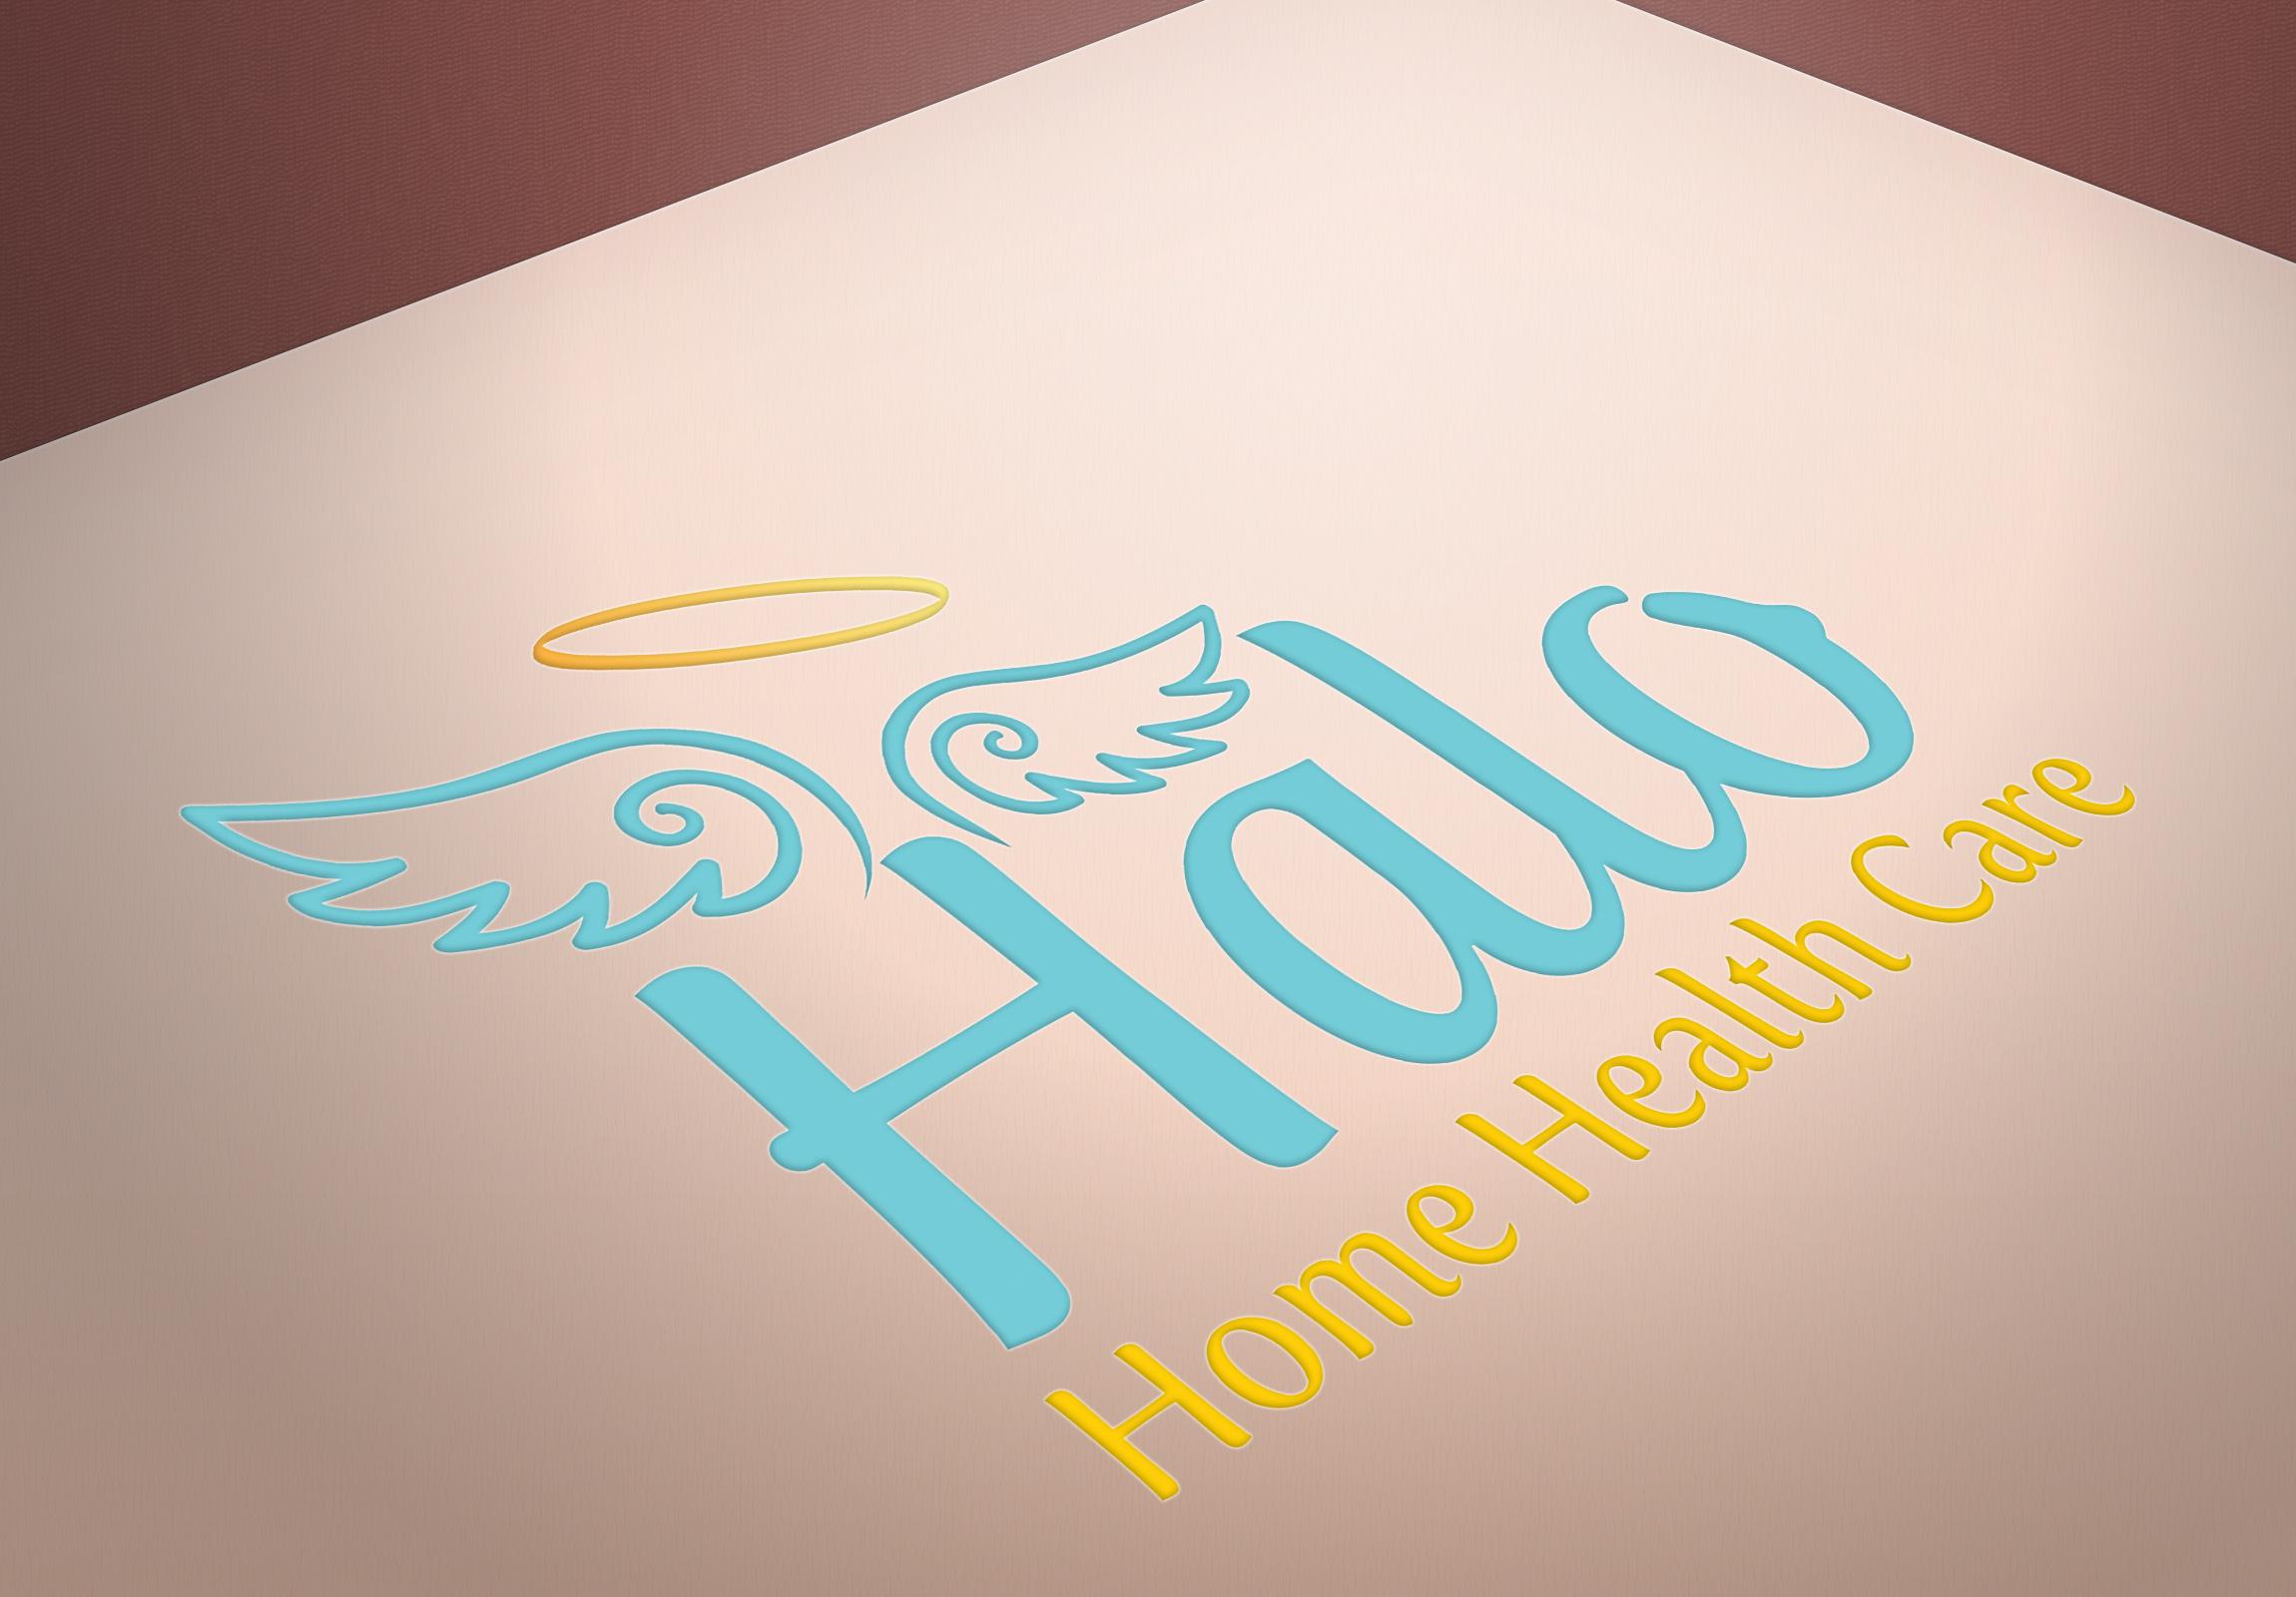 halo_hc_logo.jpg